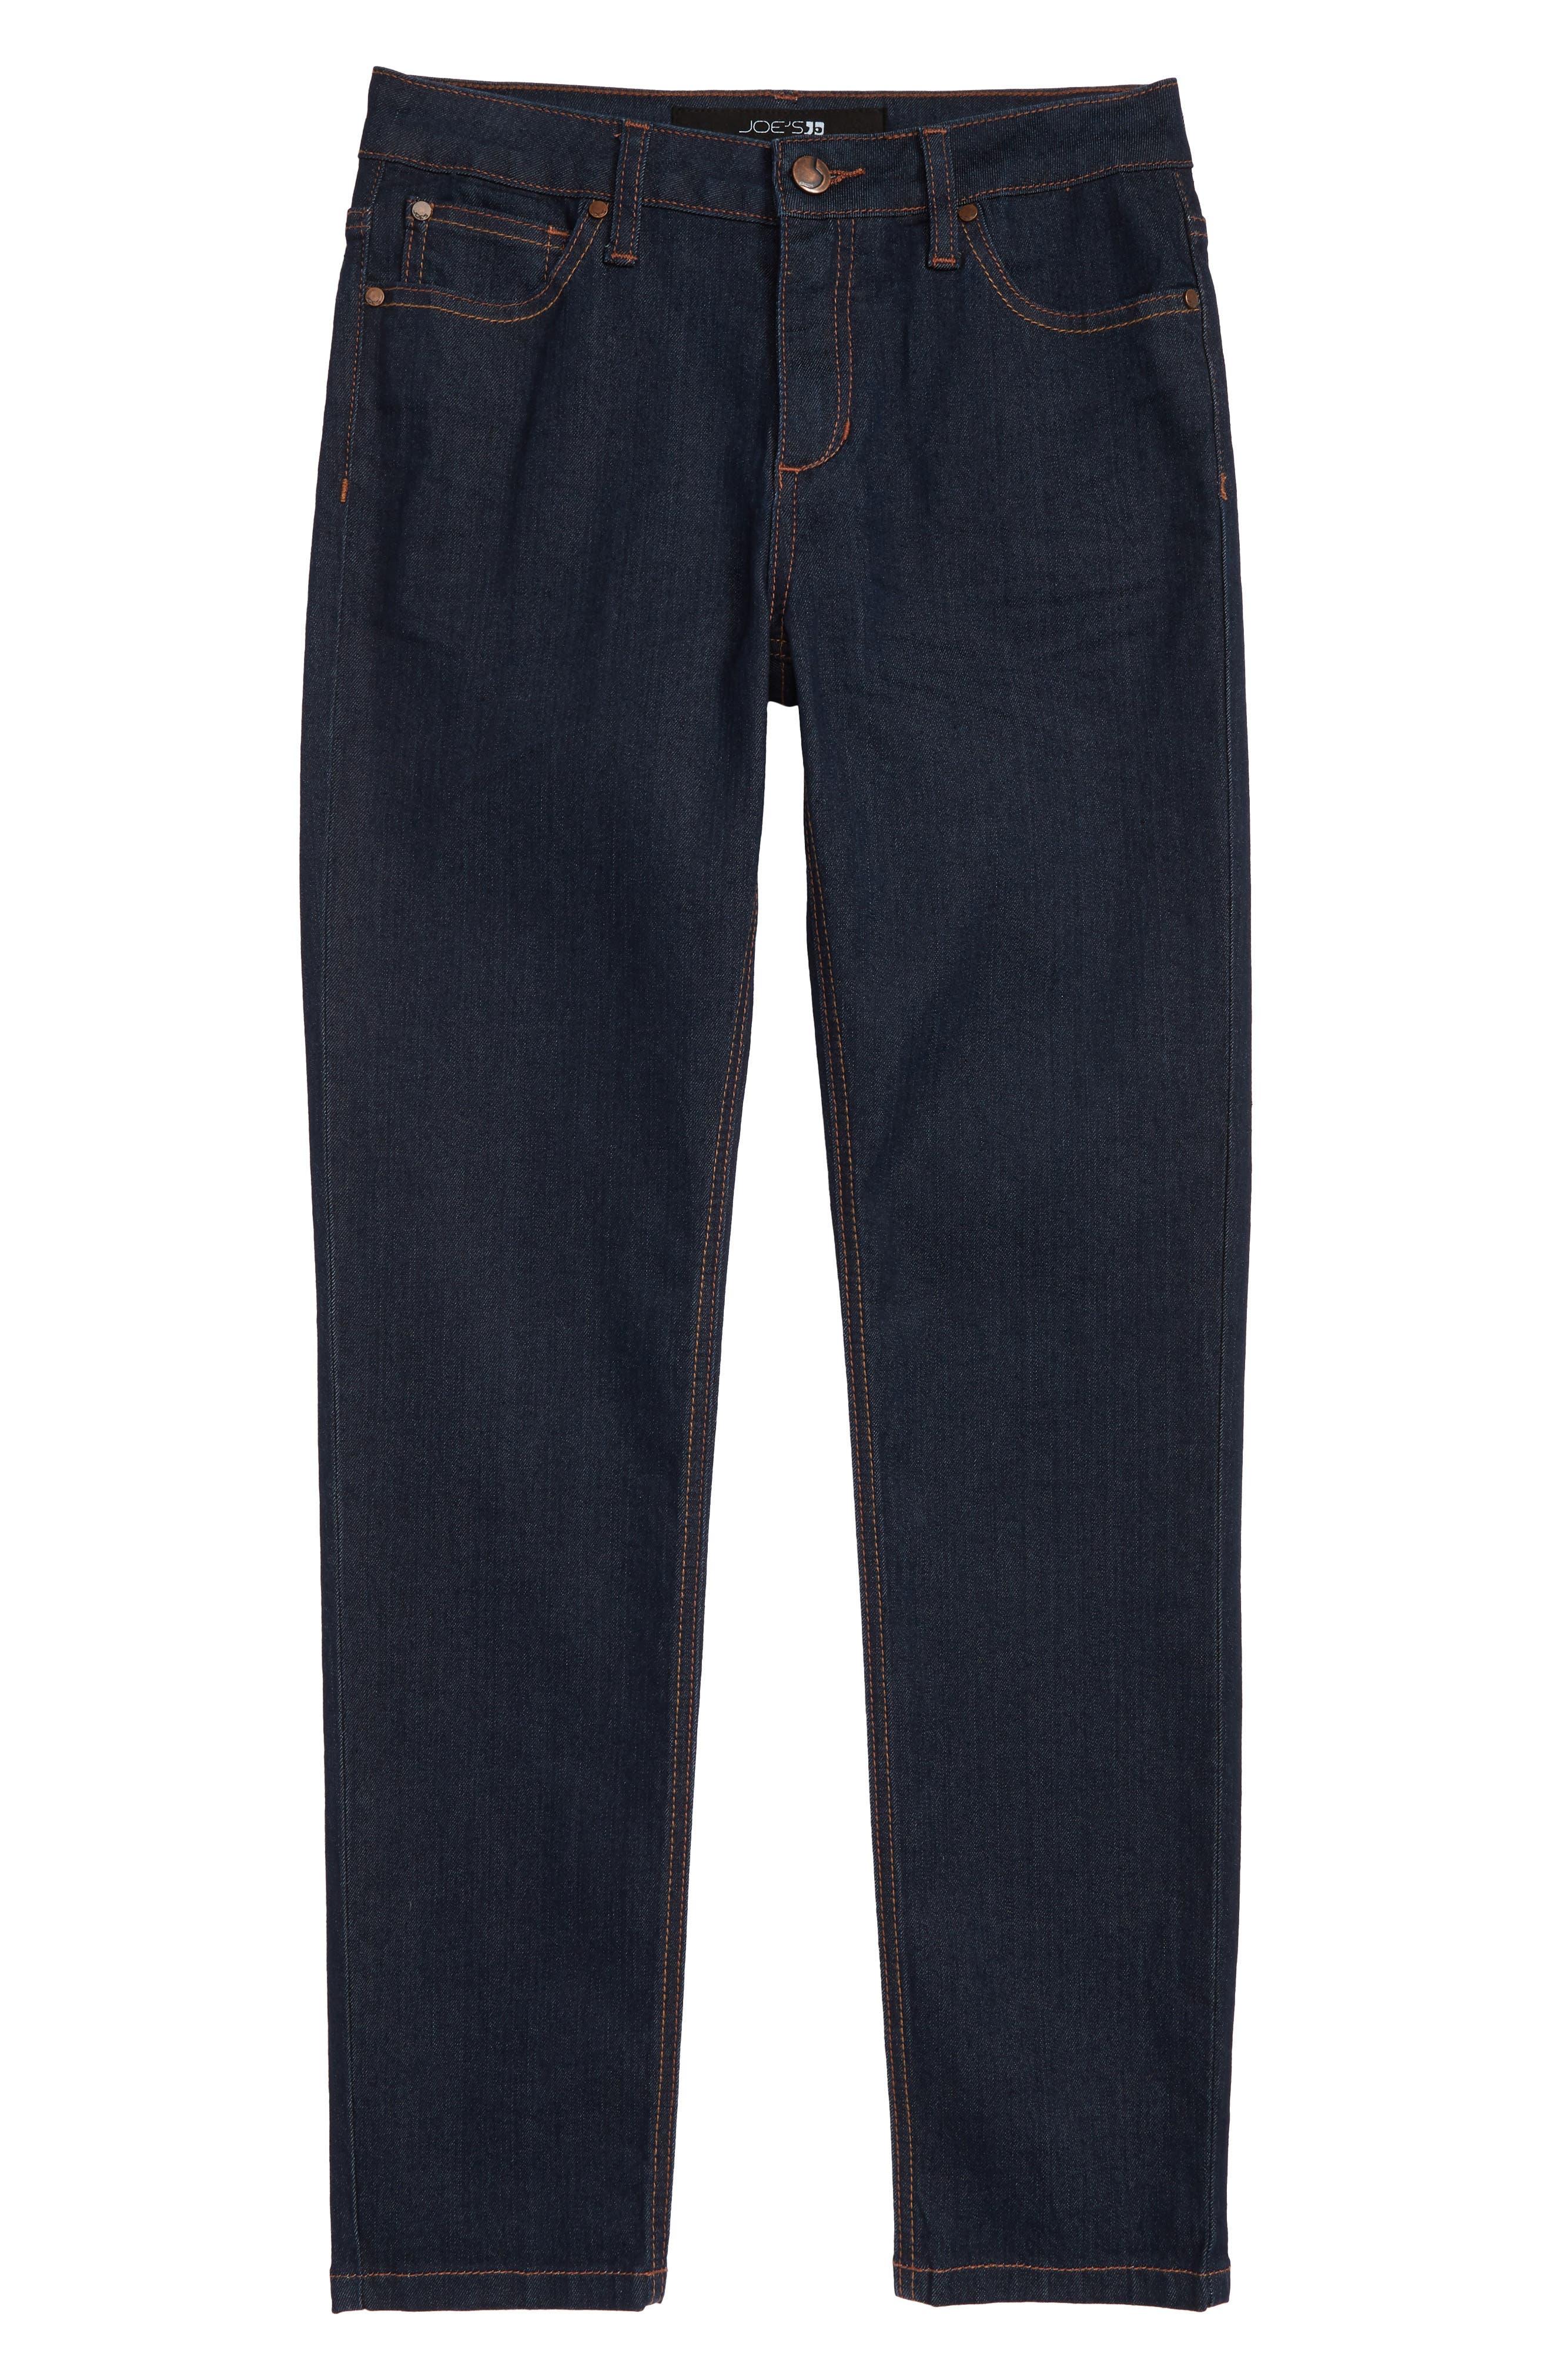 Brixton Stretch Jeans,                             Alternate thumbnail 4, color,                             DRESDEN BLUE